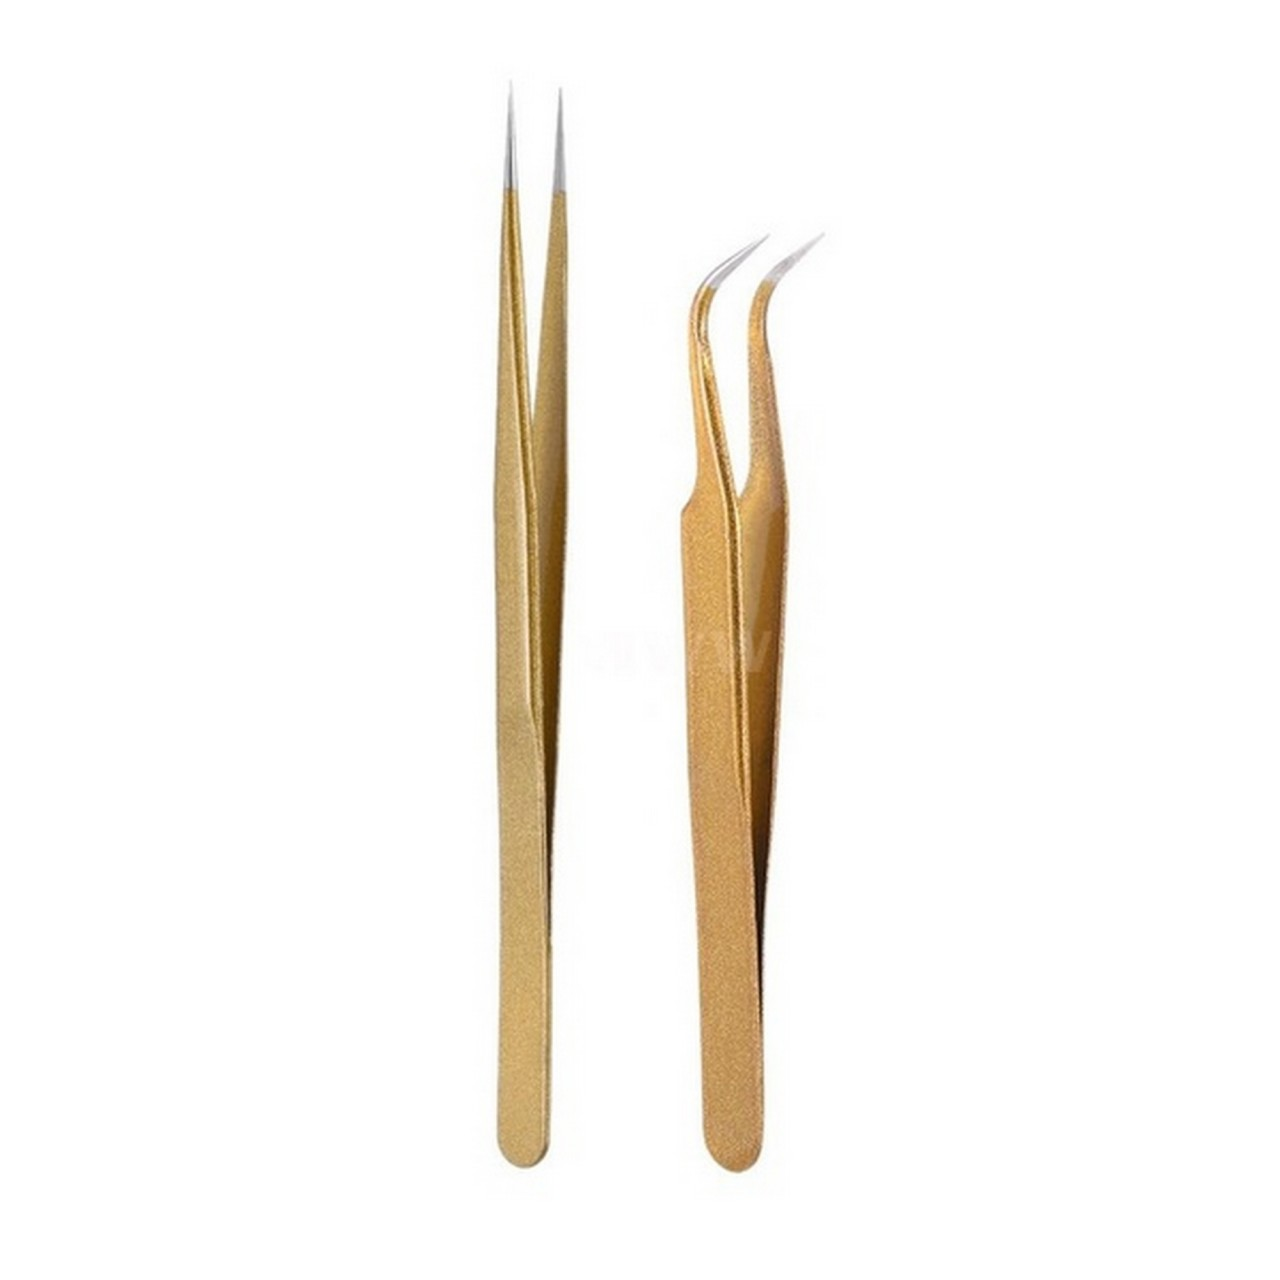 Wimpern-Pinzetten-Set – 2 Stk. Vetus HRC 40 Tweezers goldfarben